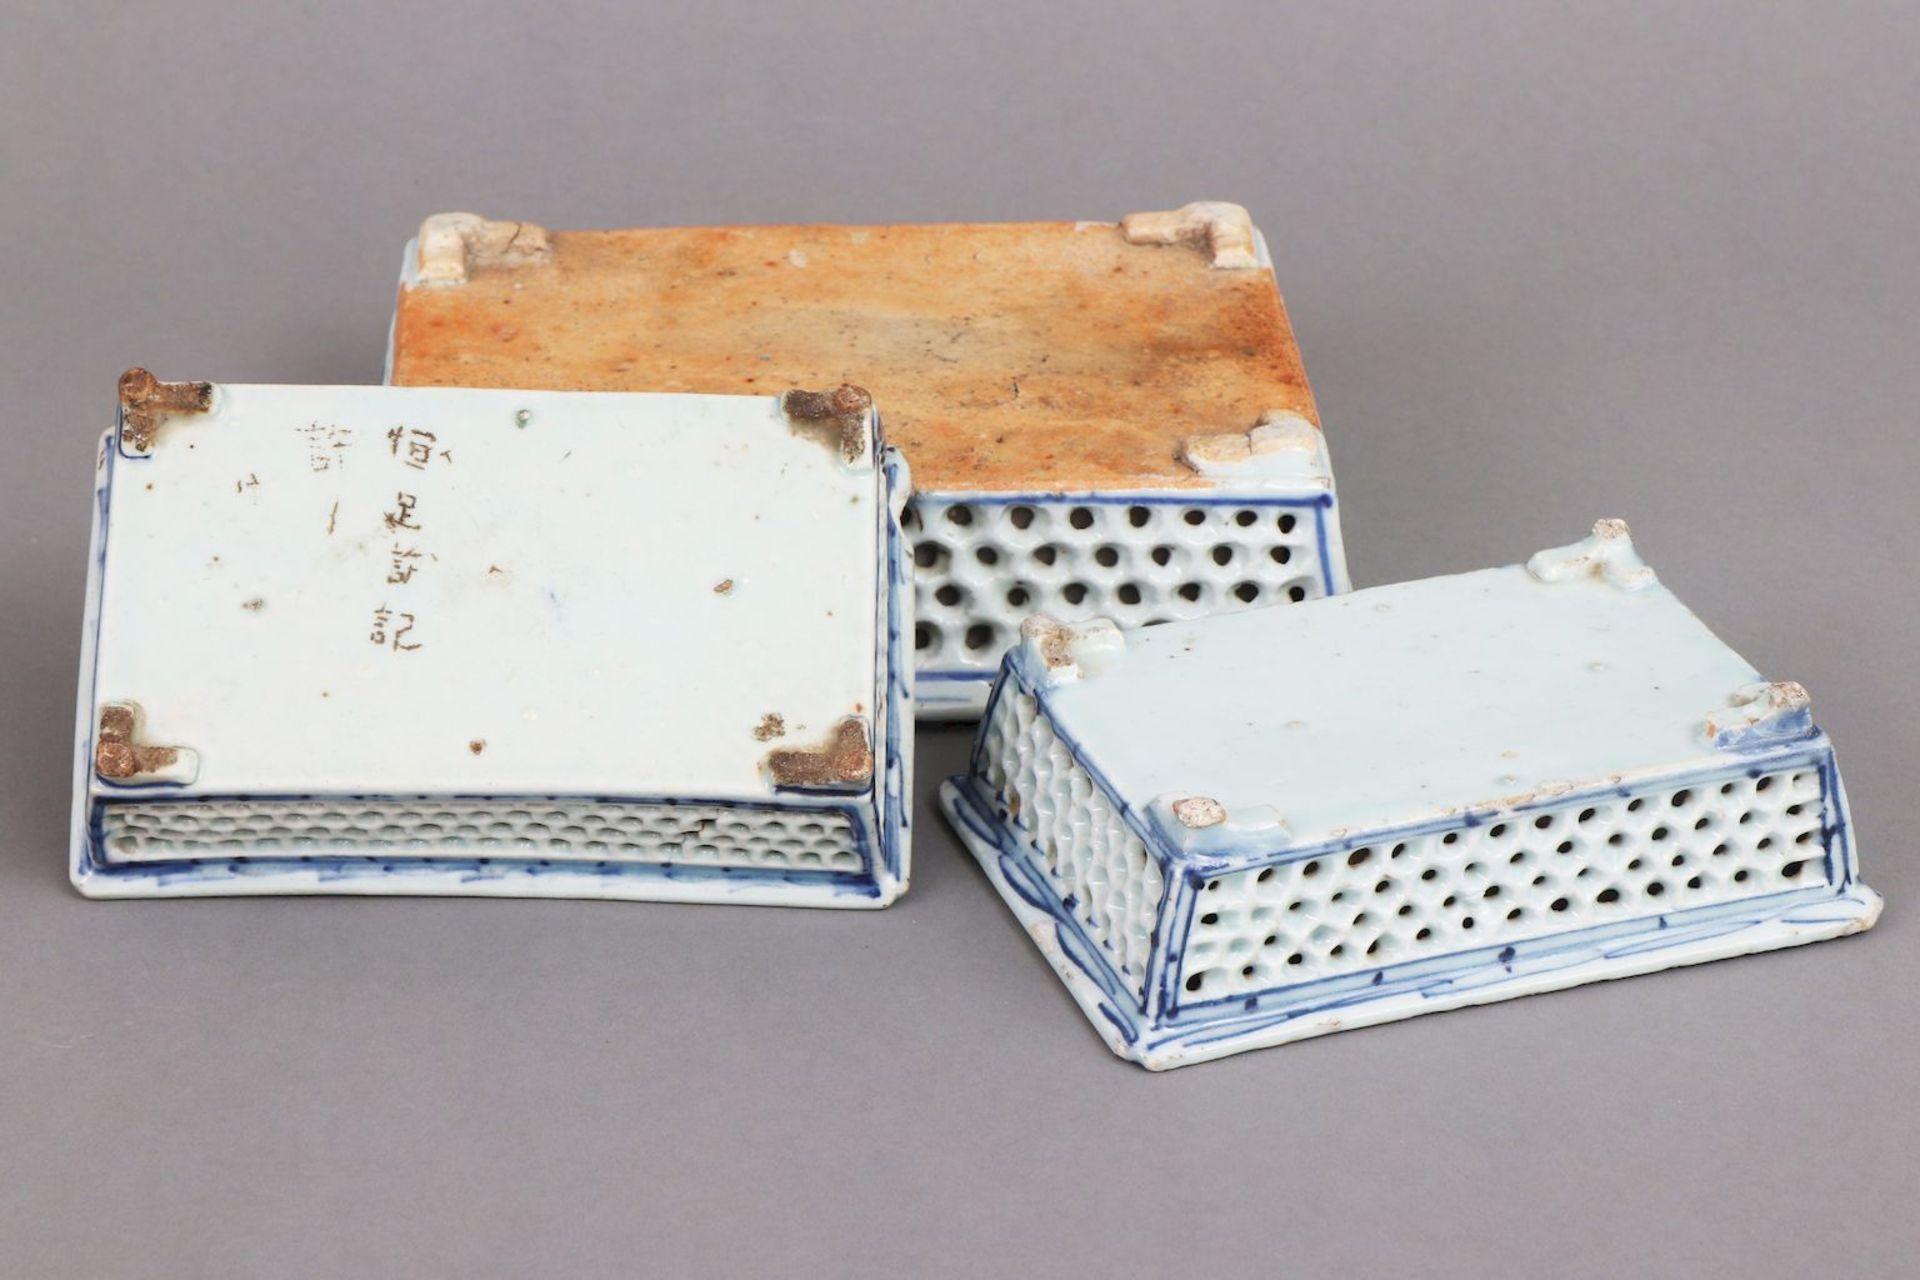 3 chinesische Bonsai-Pflanzschalen - Image 3 of 4